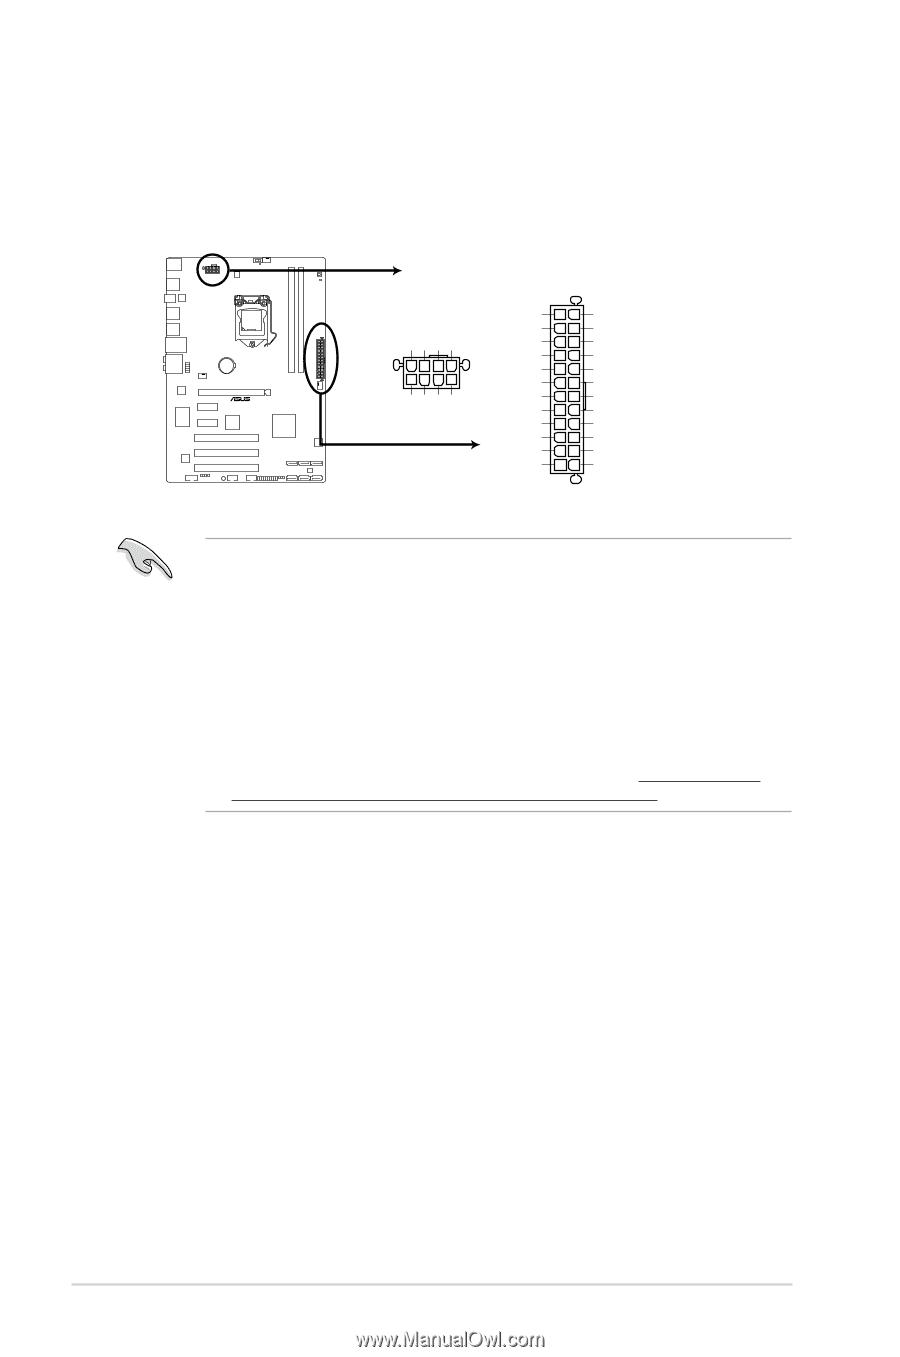 Asus P8H61 PRO | User Manual - Page 40